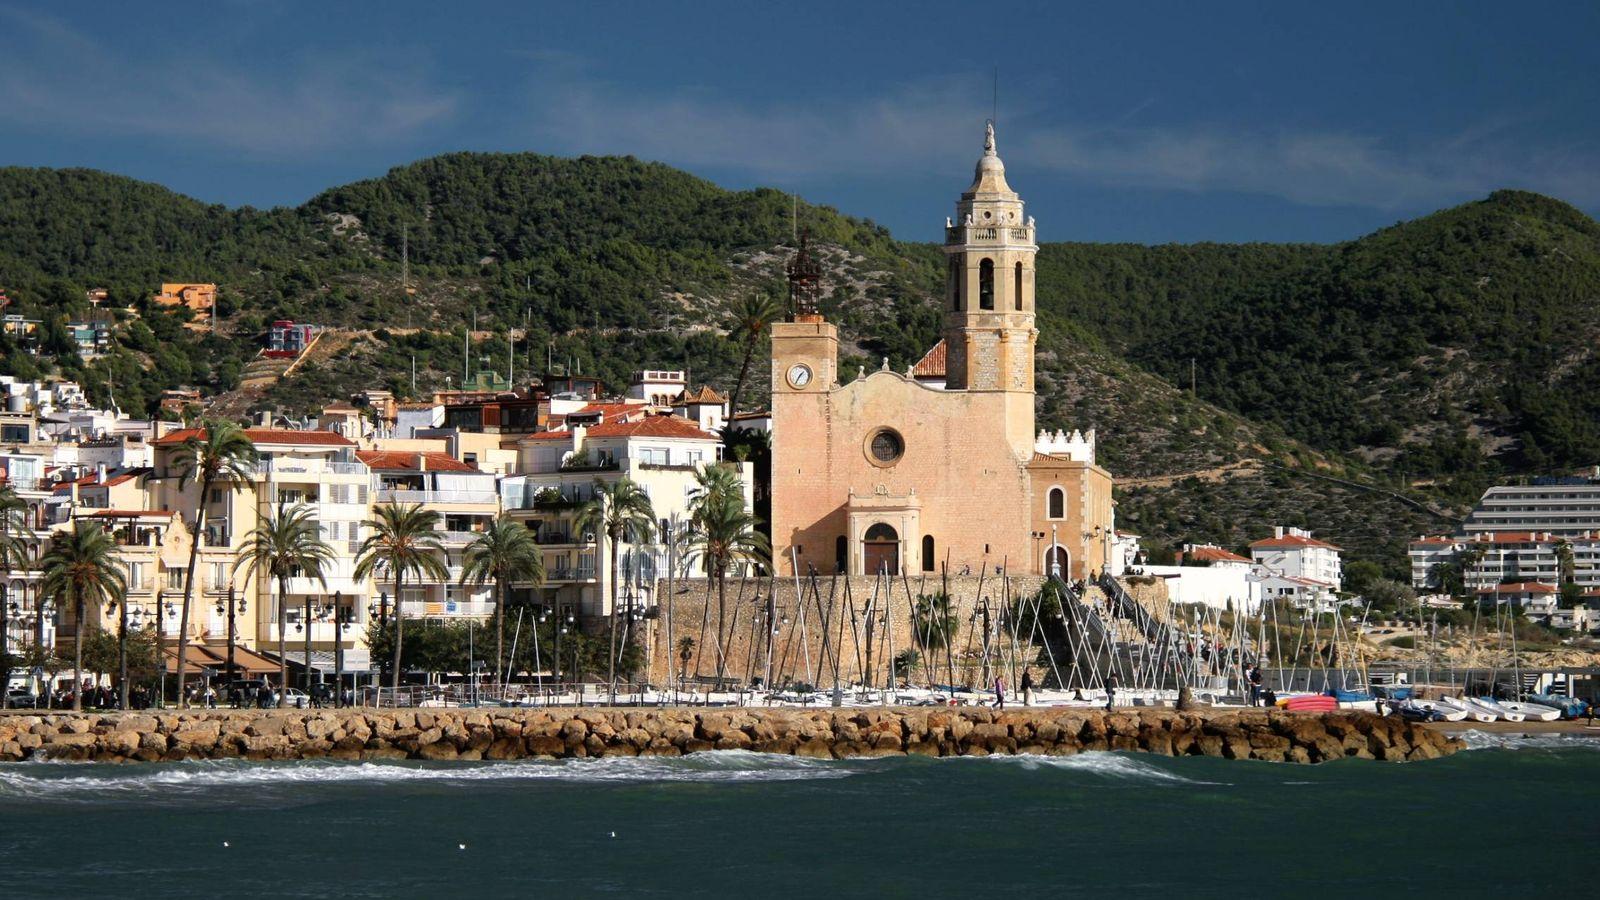 Foto: Iglesia de San Bartolomé y Santa Tecla en Sitges. (Jorge Franganillo)